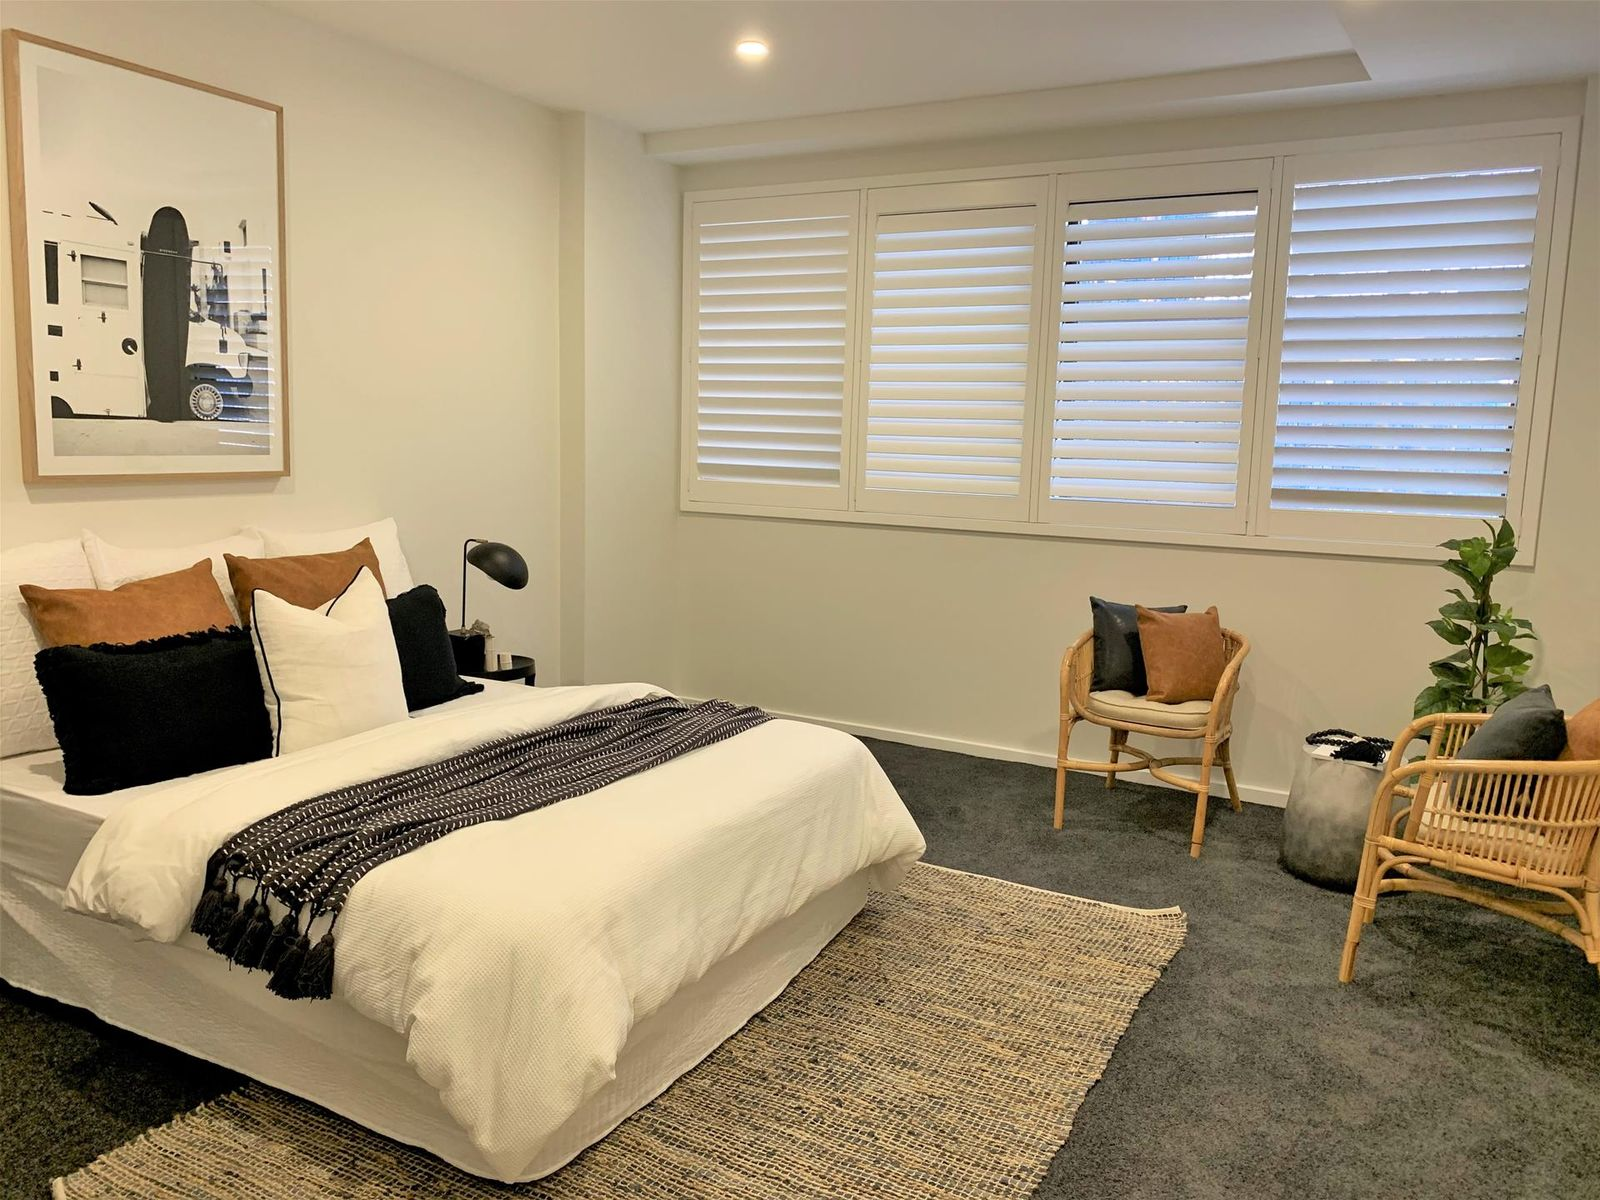 201/50-52 Head Street, Forster, NSW 2428